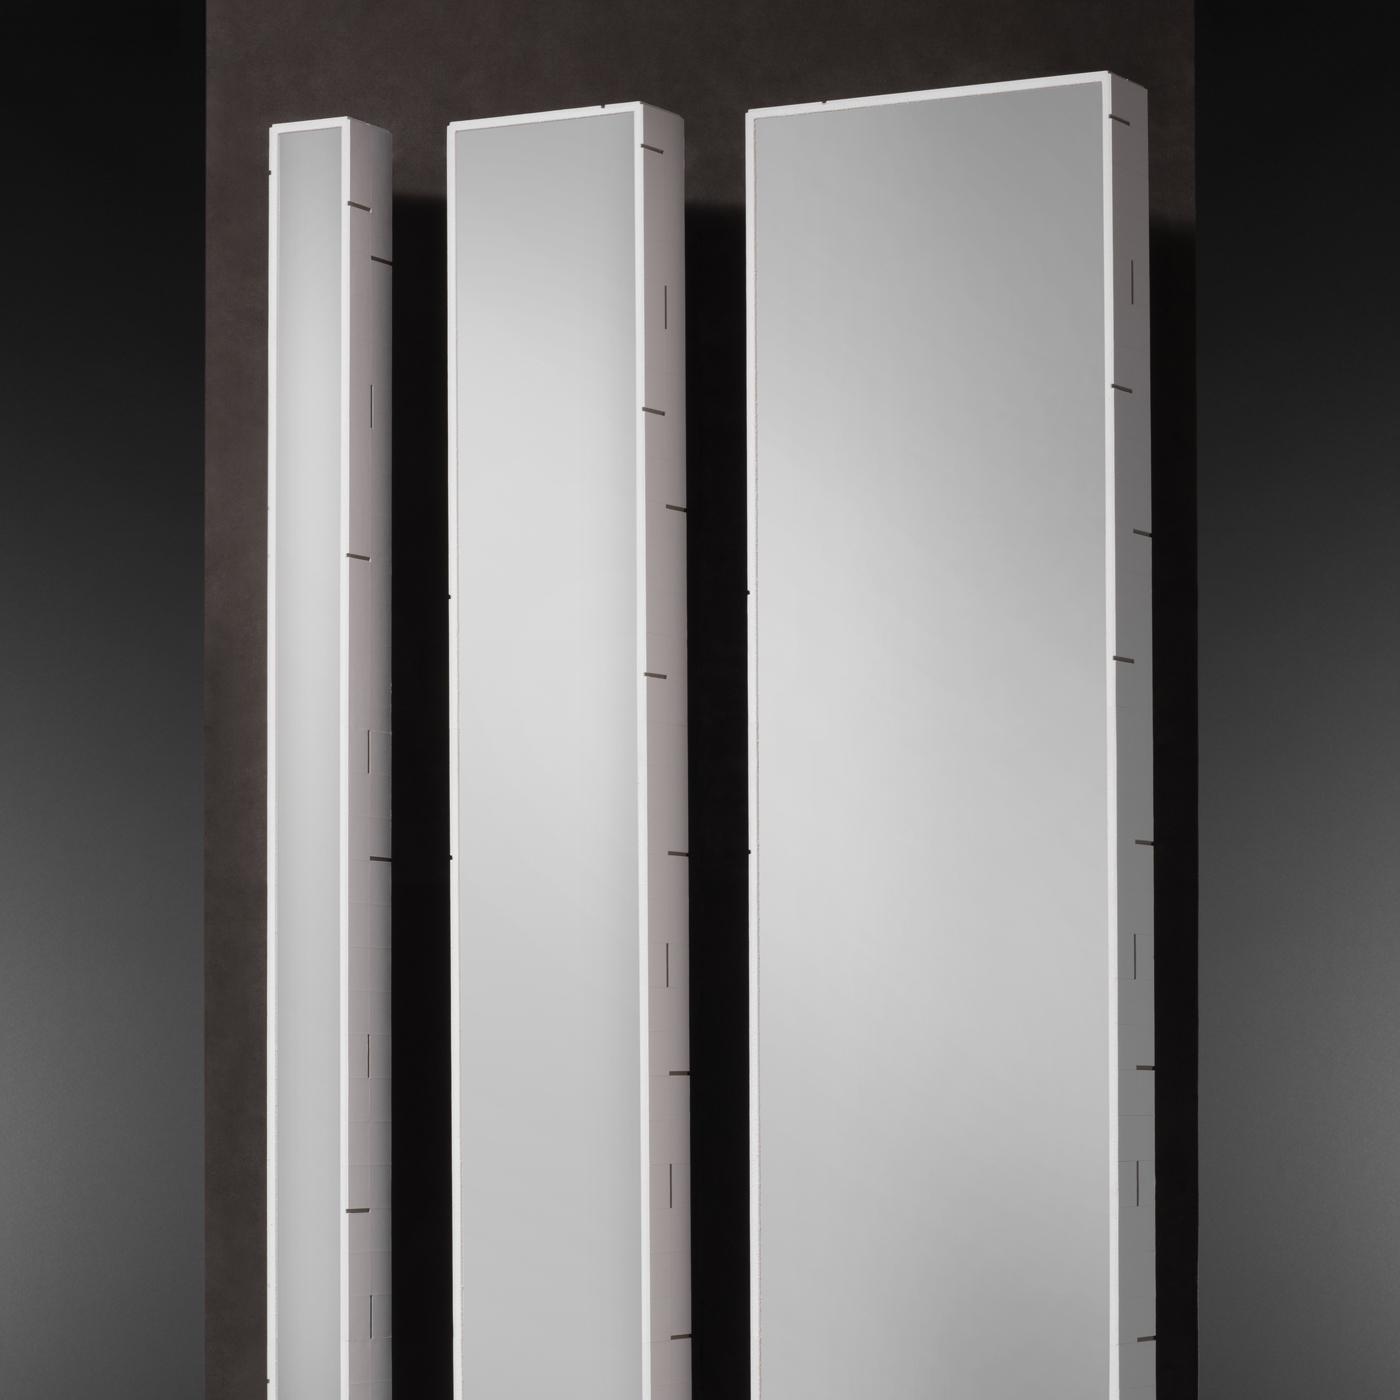 Stick On Wall Mirrors Regarding Preferred Atari Stick Large Wall Mirrorrabitti (View 20 of 20)